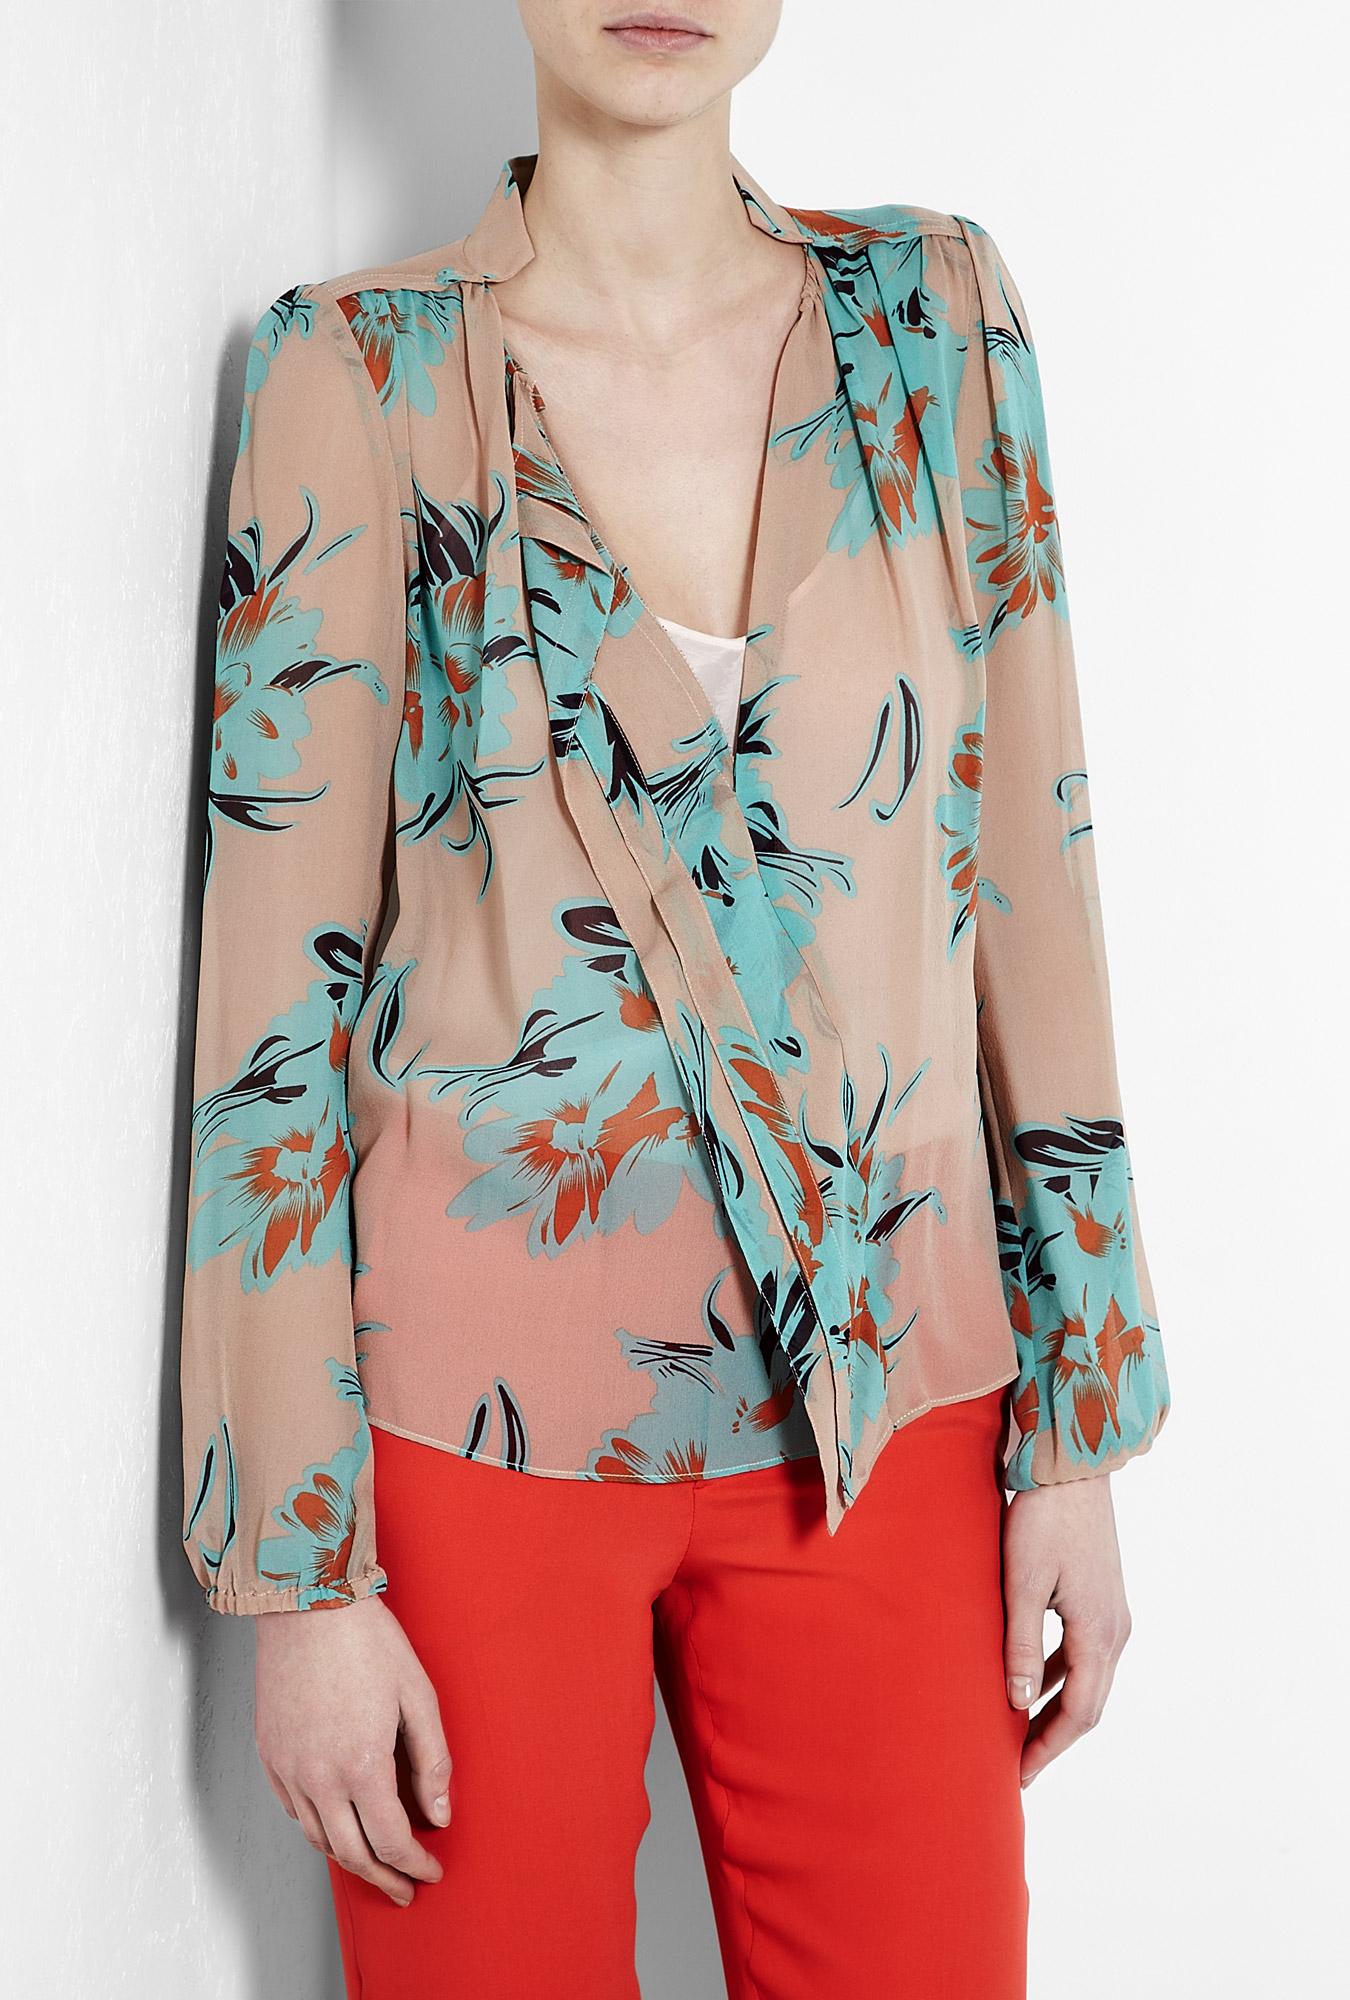 33c287f9ceb48 By Malene Birger Bartolomea Floral Print V Neck Silk Blouse ...